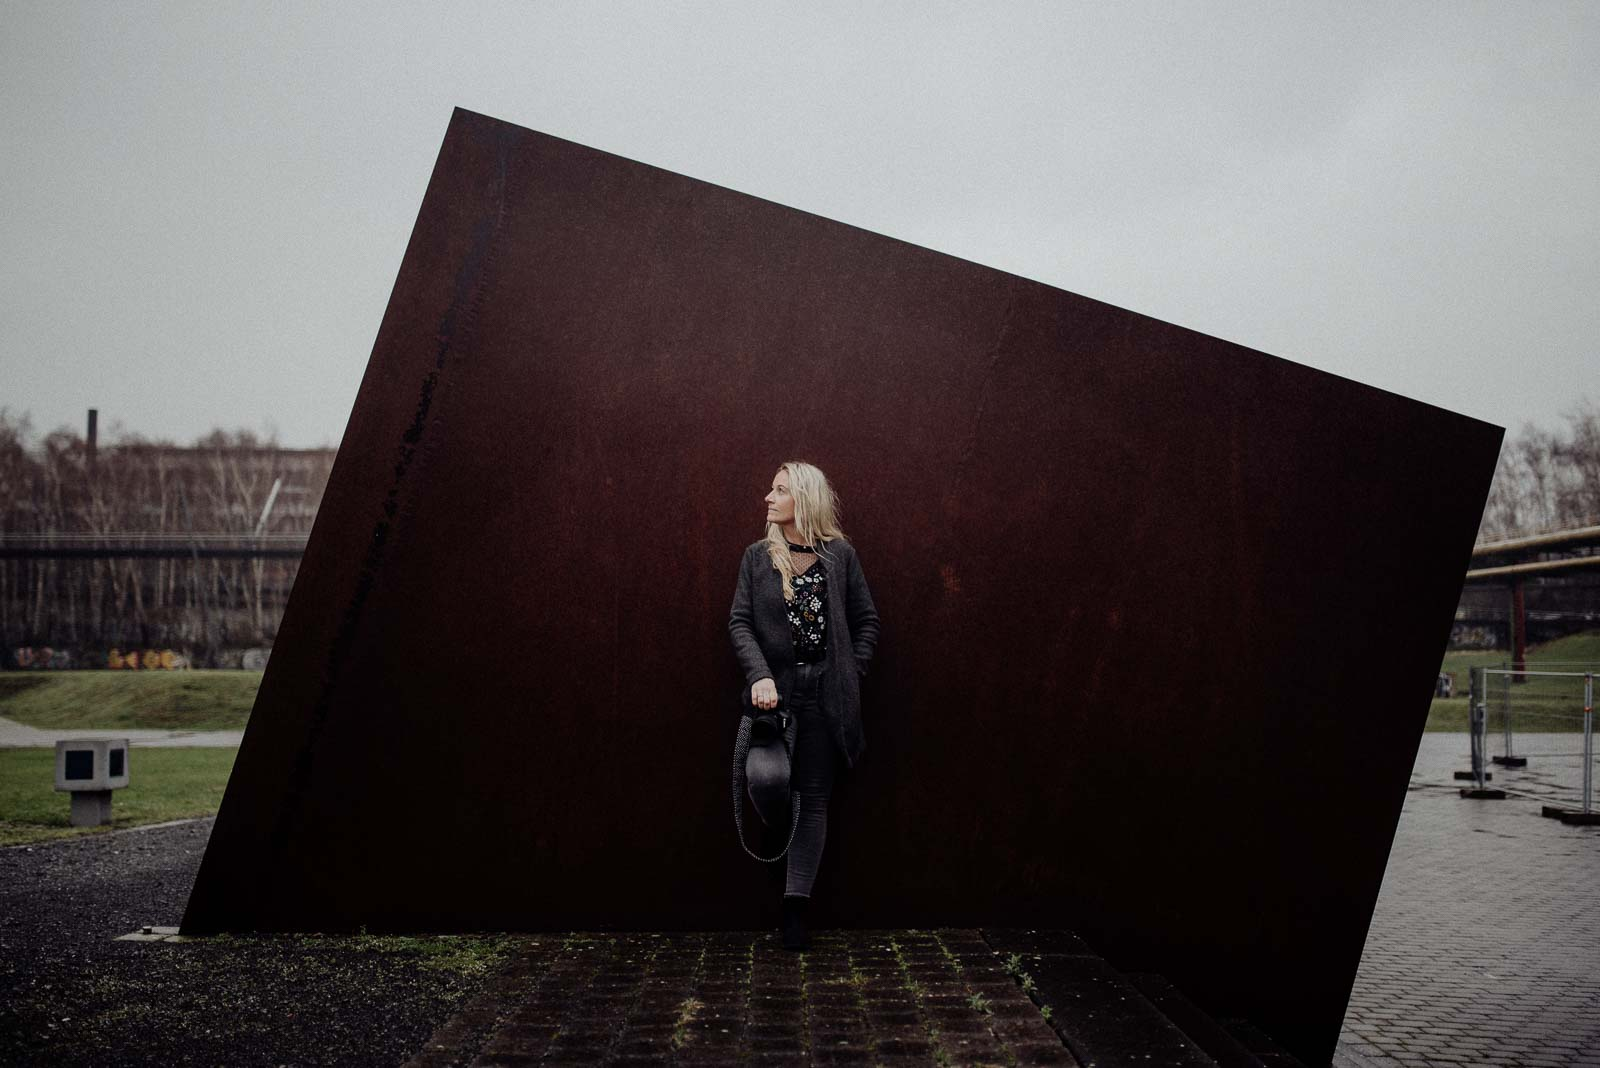 034-fotograf-witten-bochum-businessshooting-urban